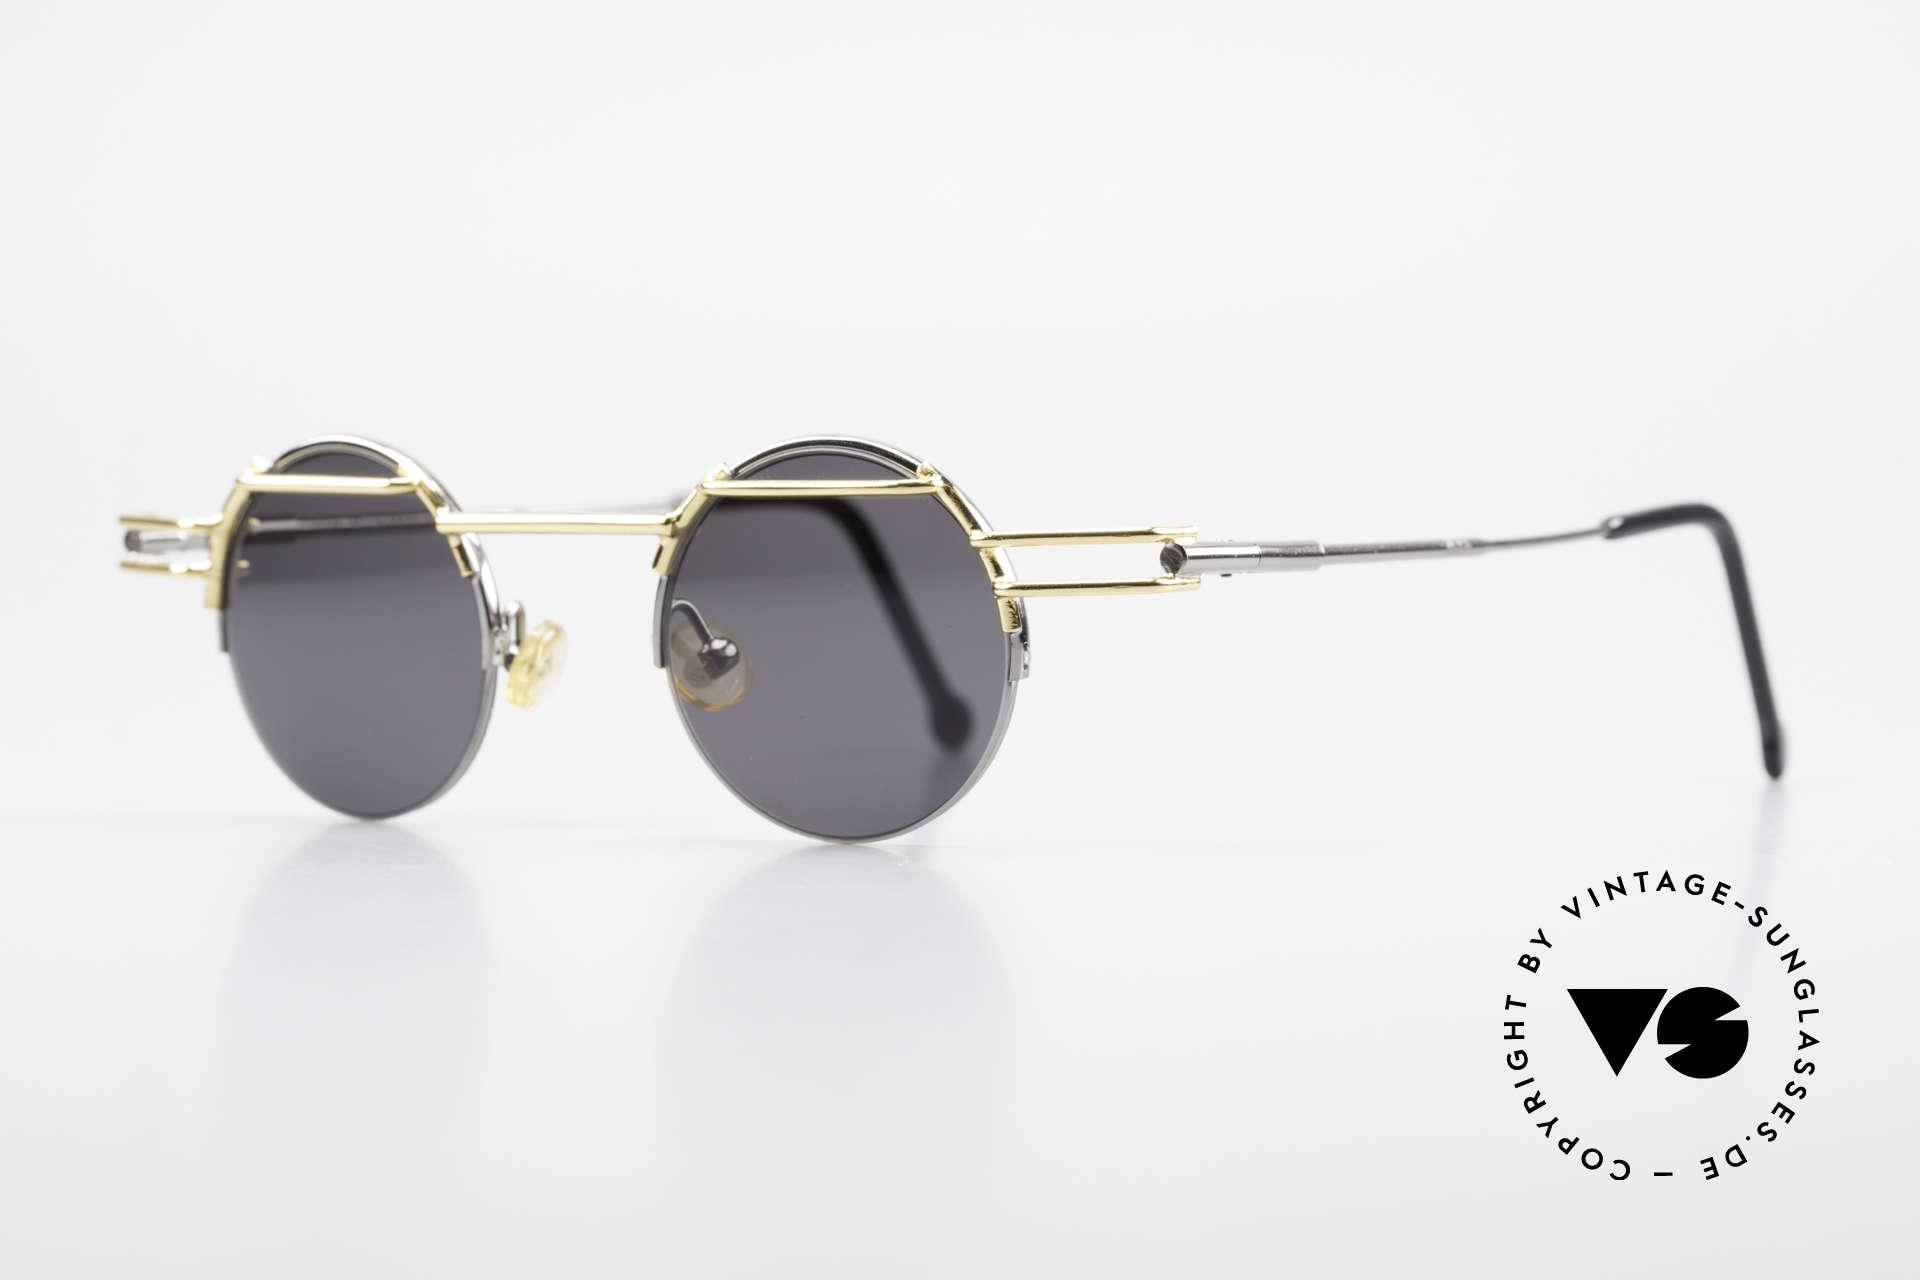 IMAGO Luna 90s Designer Sunglasses Round, multifaceted designs & craftsmanship 'made in Germany', Made for Men and Women